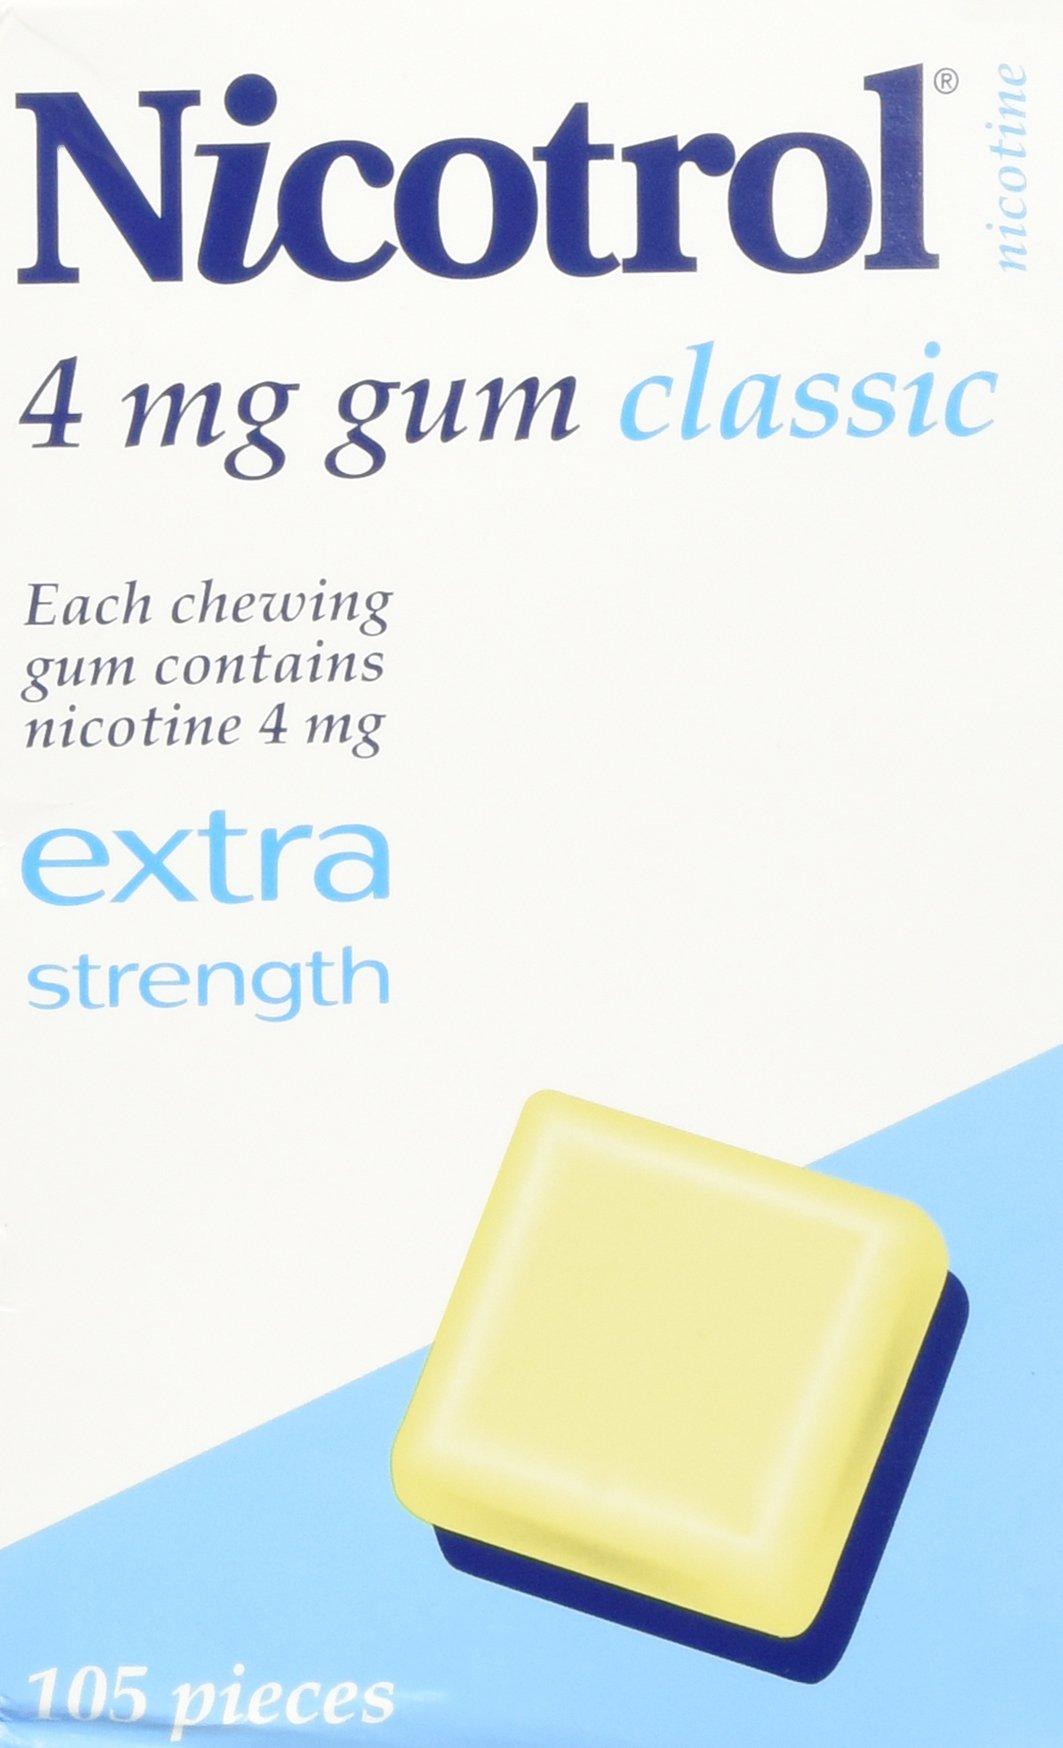 Nicotrol Nicotine Gum 4mg Classic 2 Boxes 210 Pieces